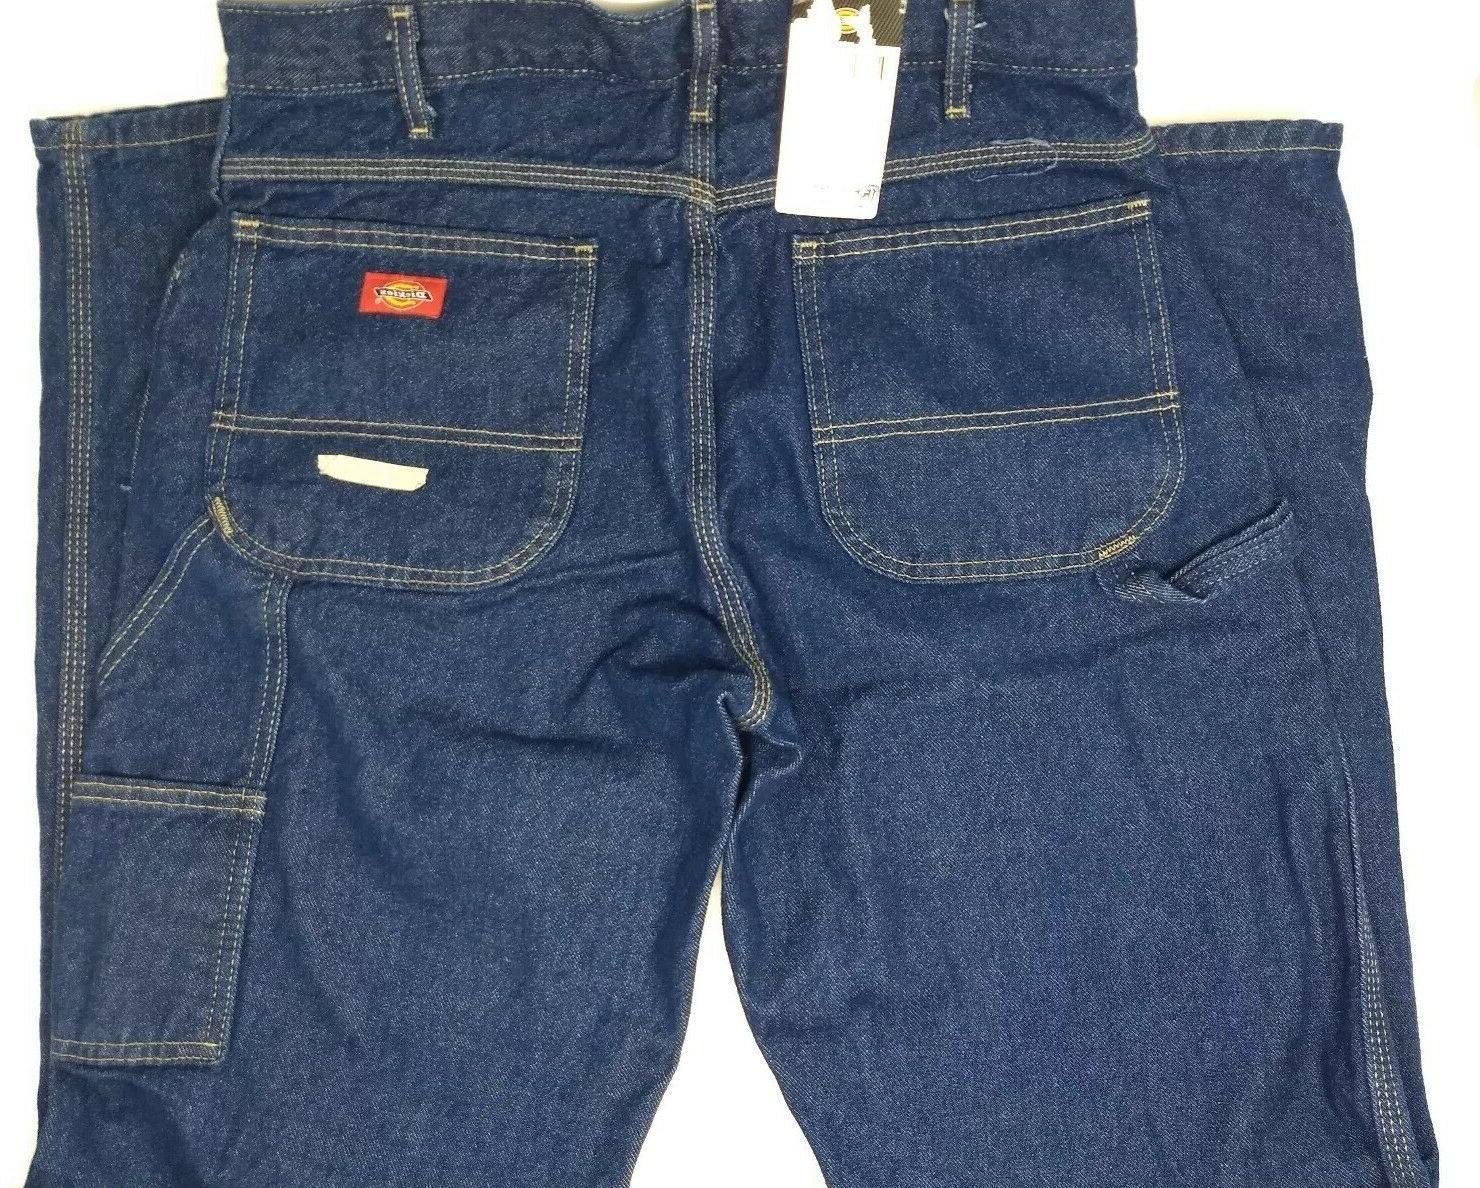 NWT Jeans 34 x